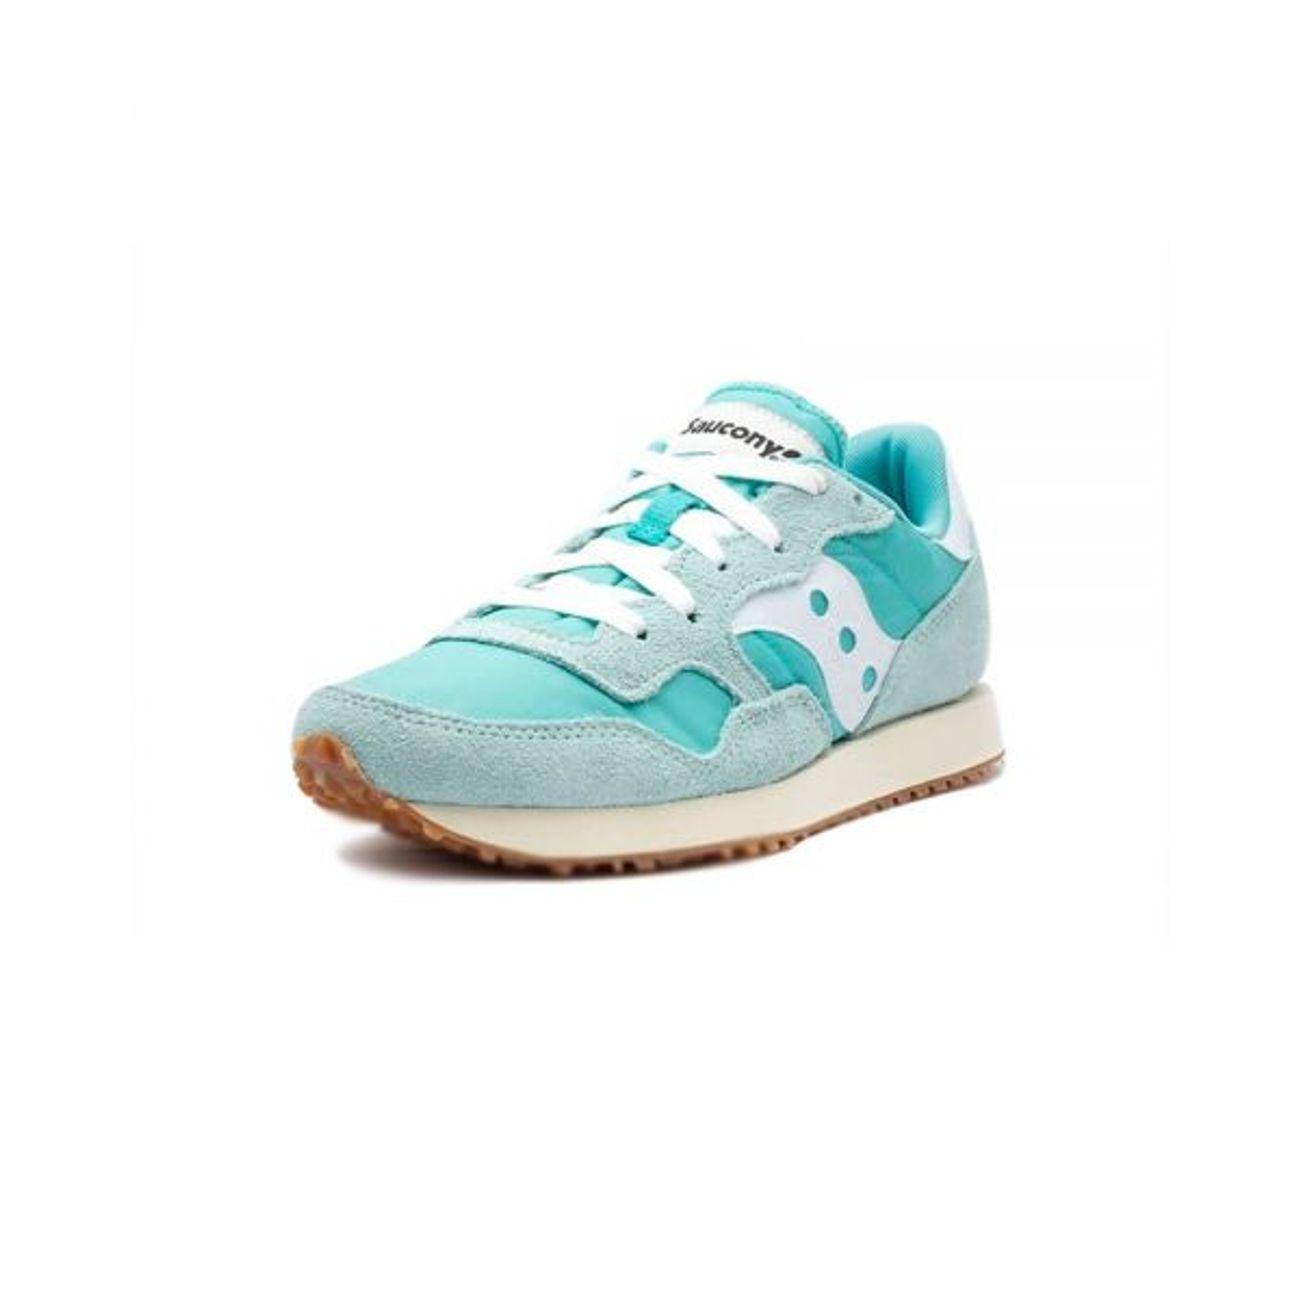 Trainer Adulte Turquoise 42 Running Dxn S60369 Saucony Vintage XOiPkTZu